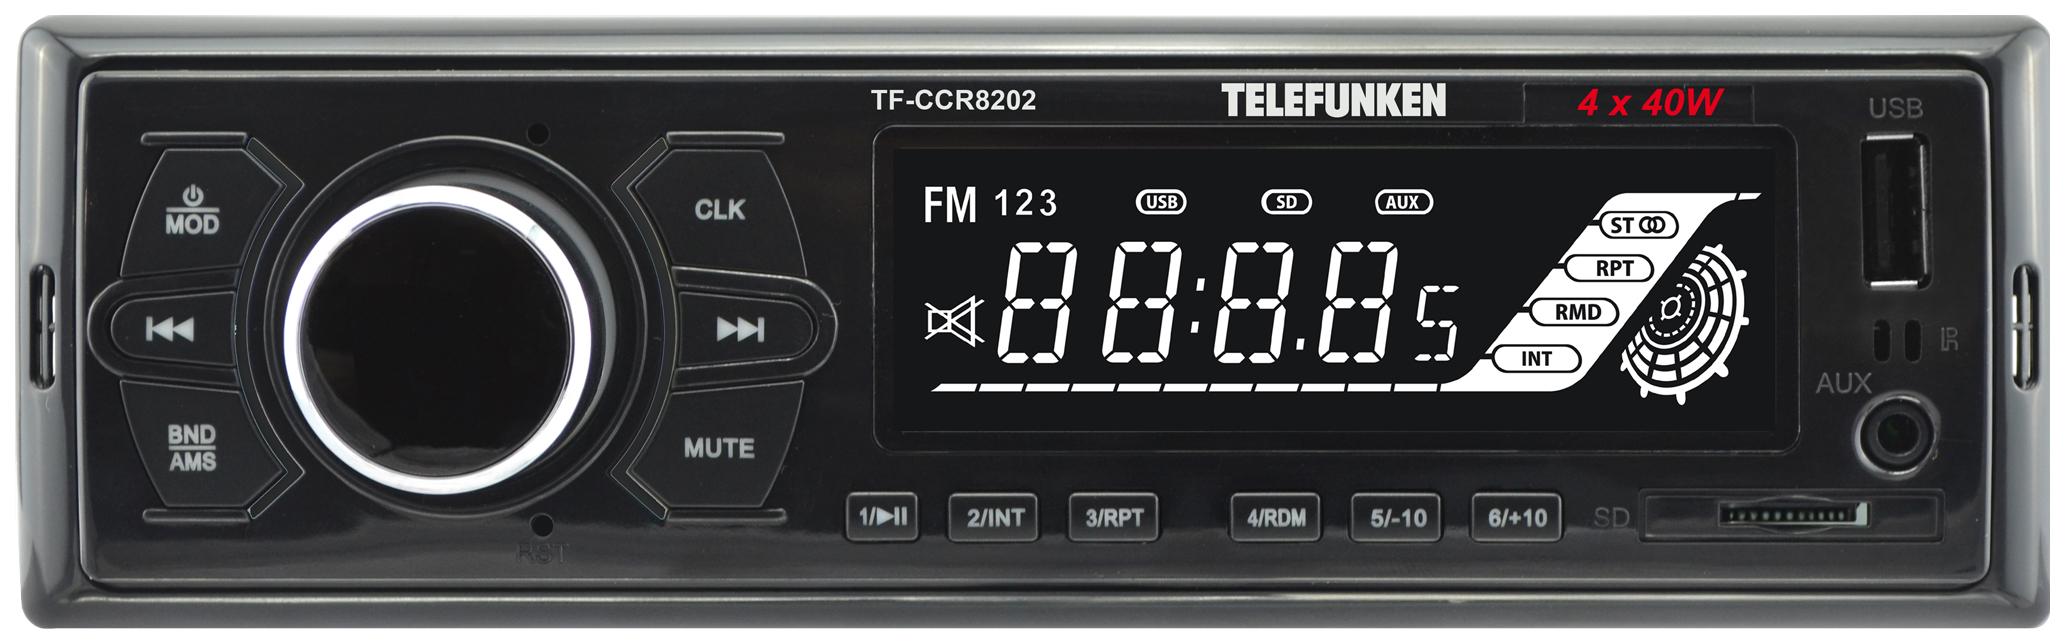 CAM Telefunken TF-CCR8202